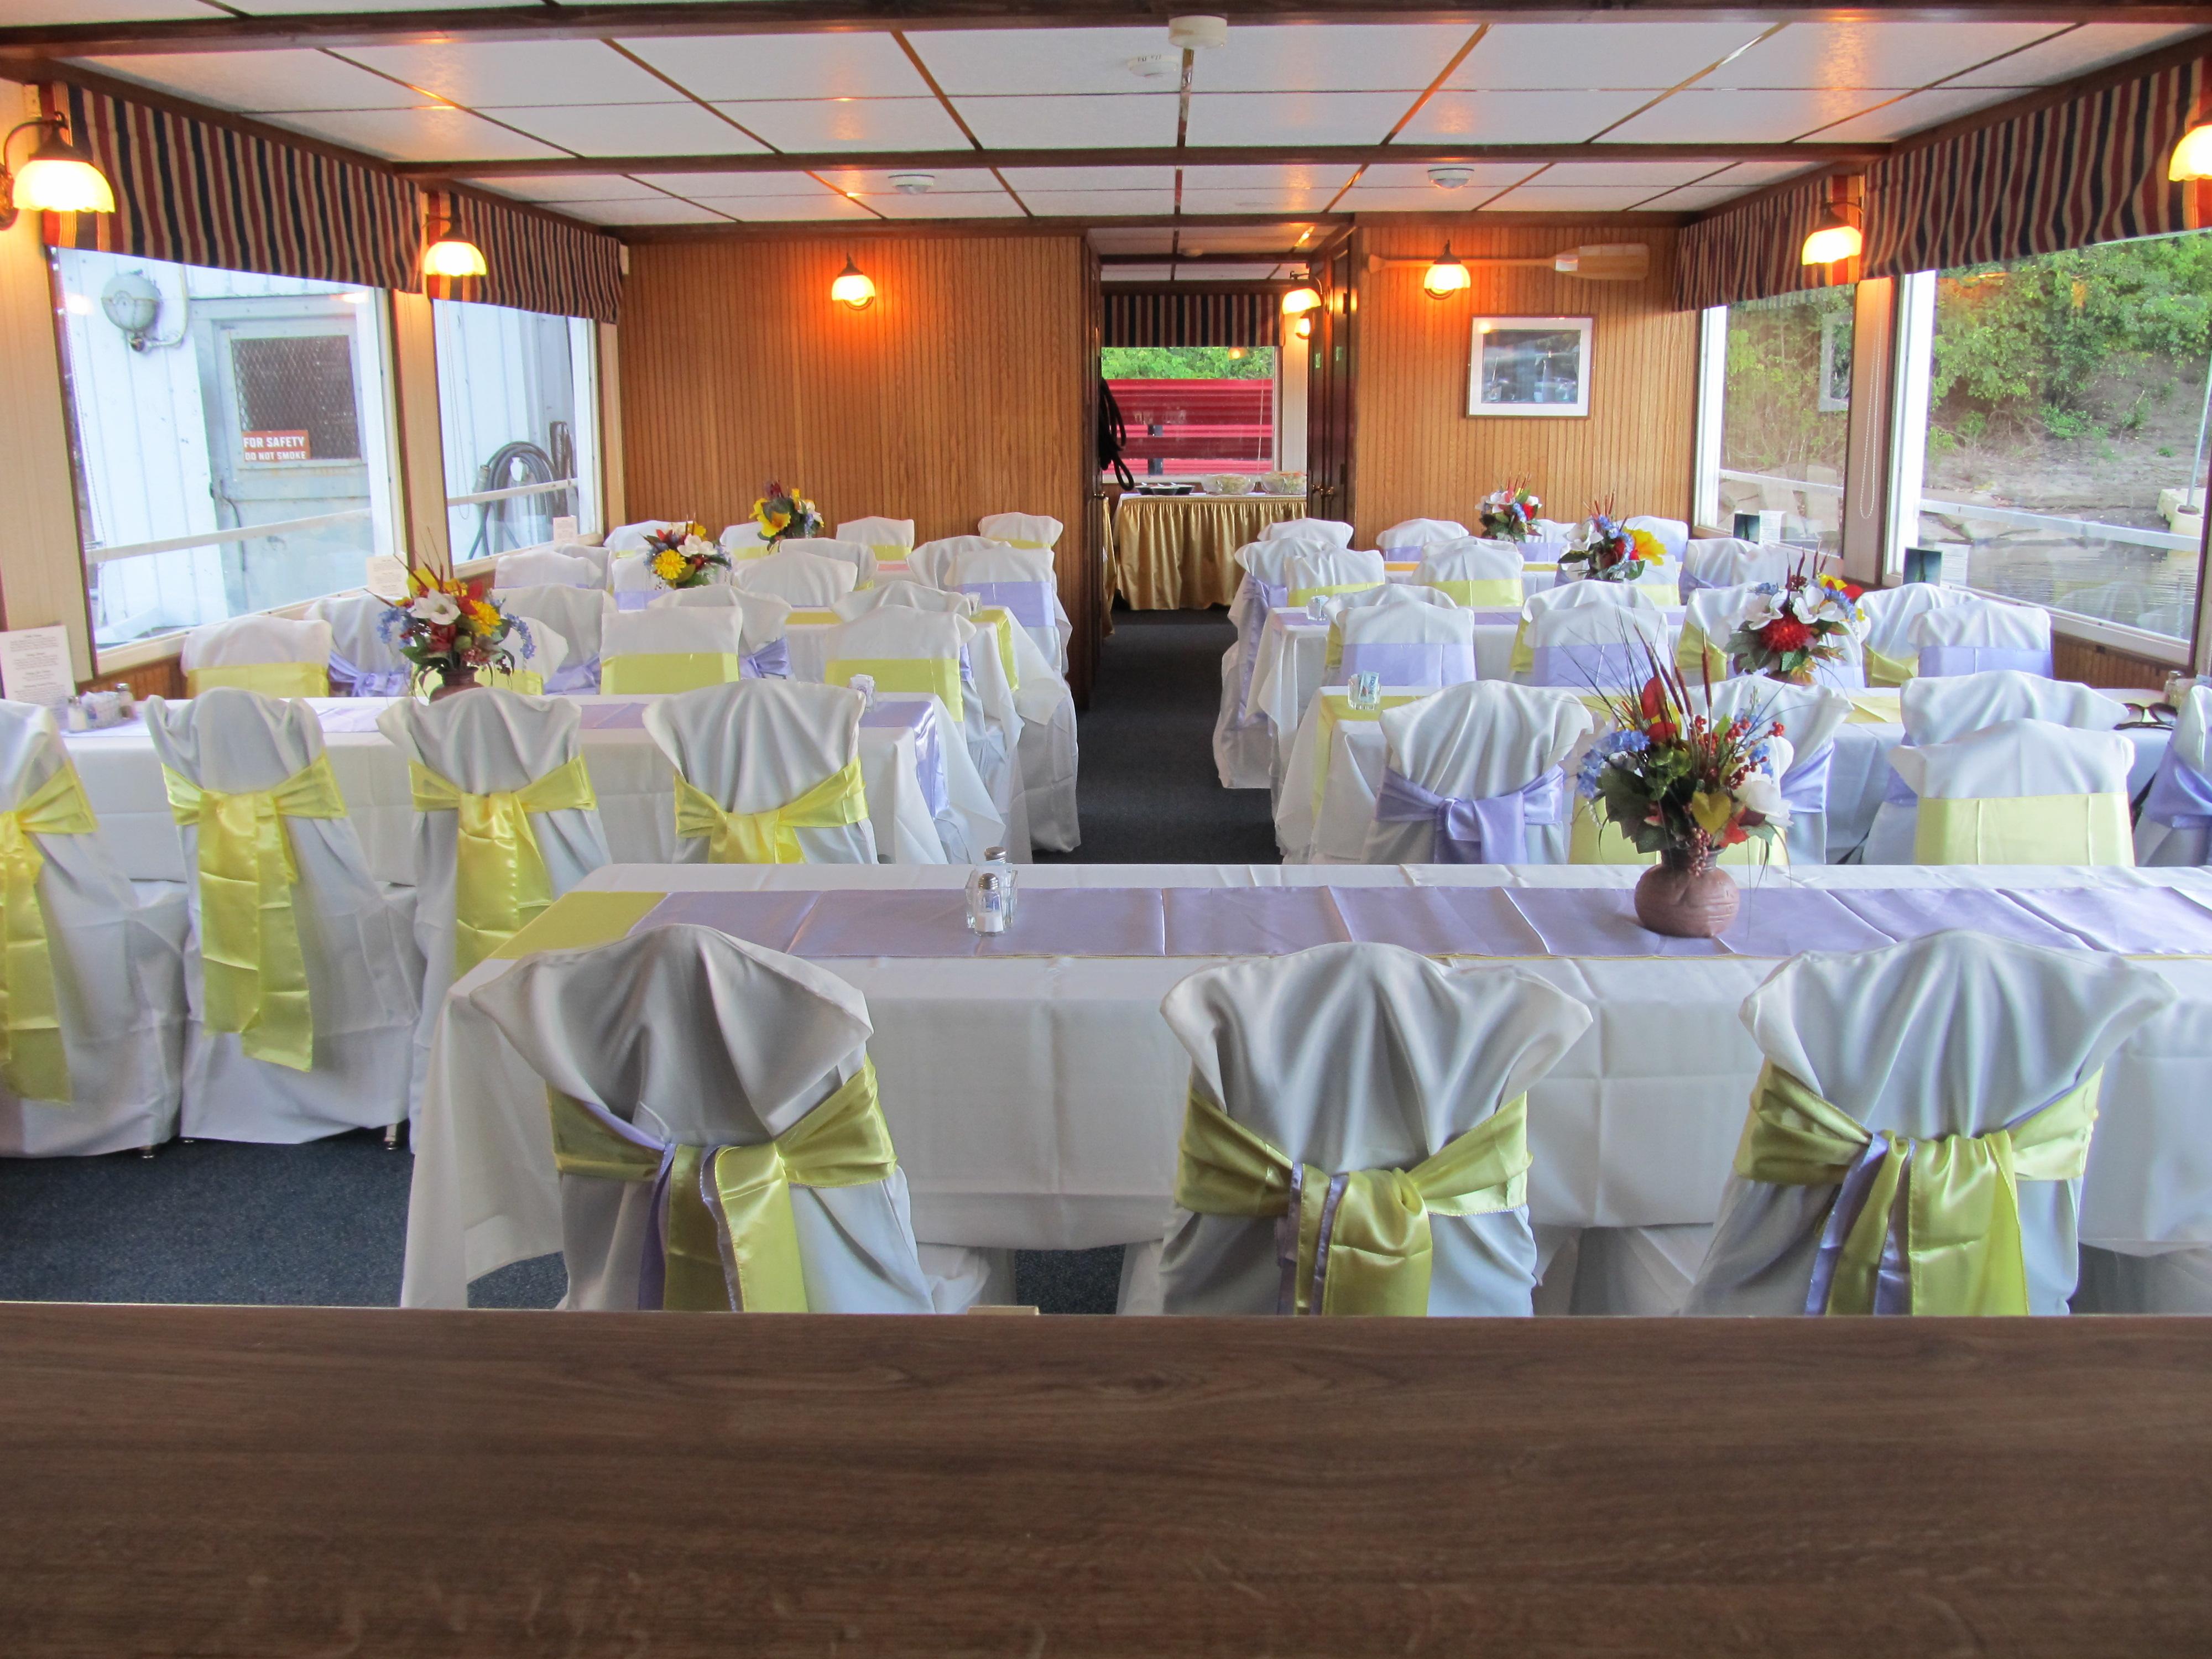 Magnolia Blossom Cruises image 5